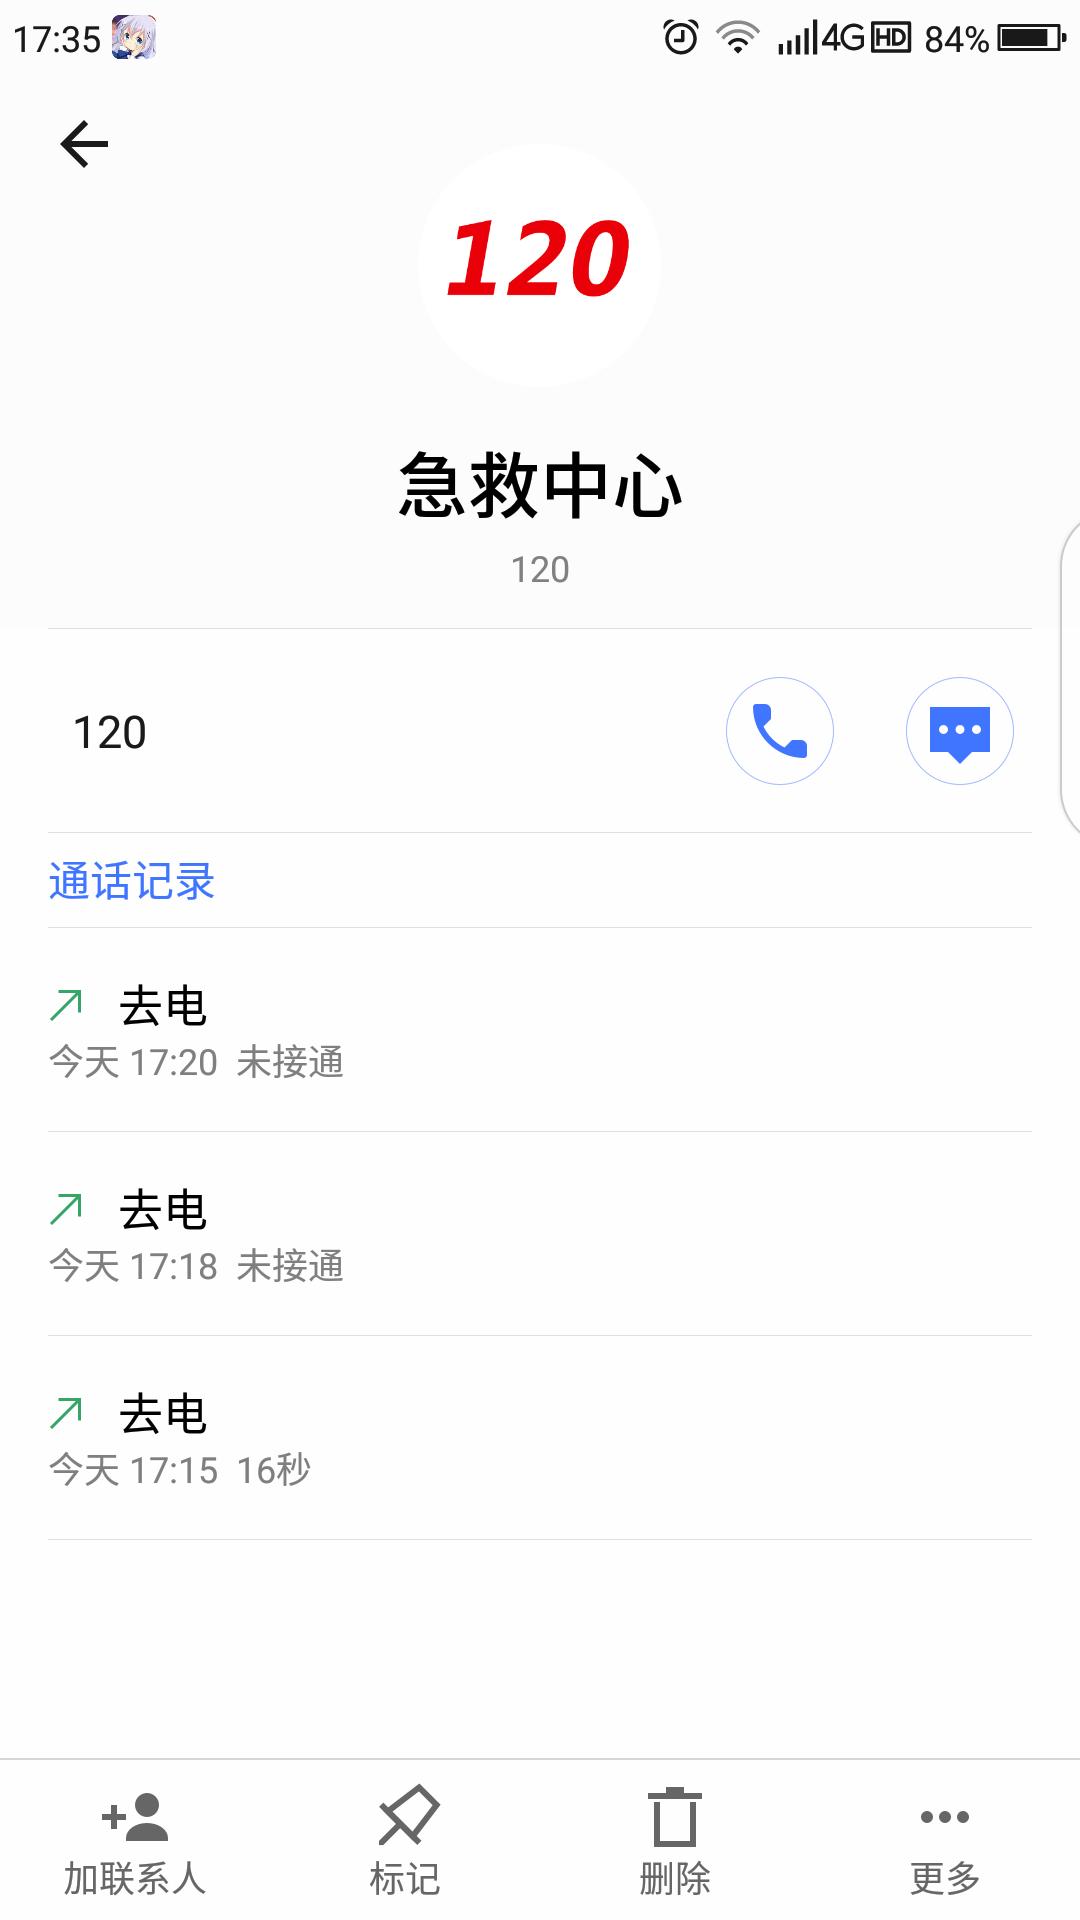 Screenshot_2018-06-25-17-35-58.png